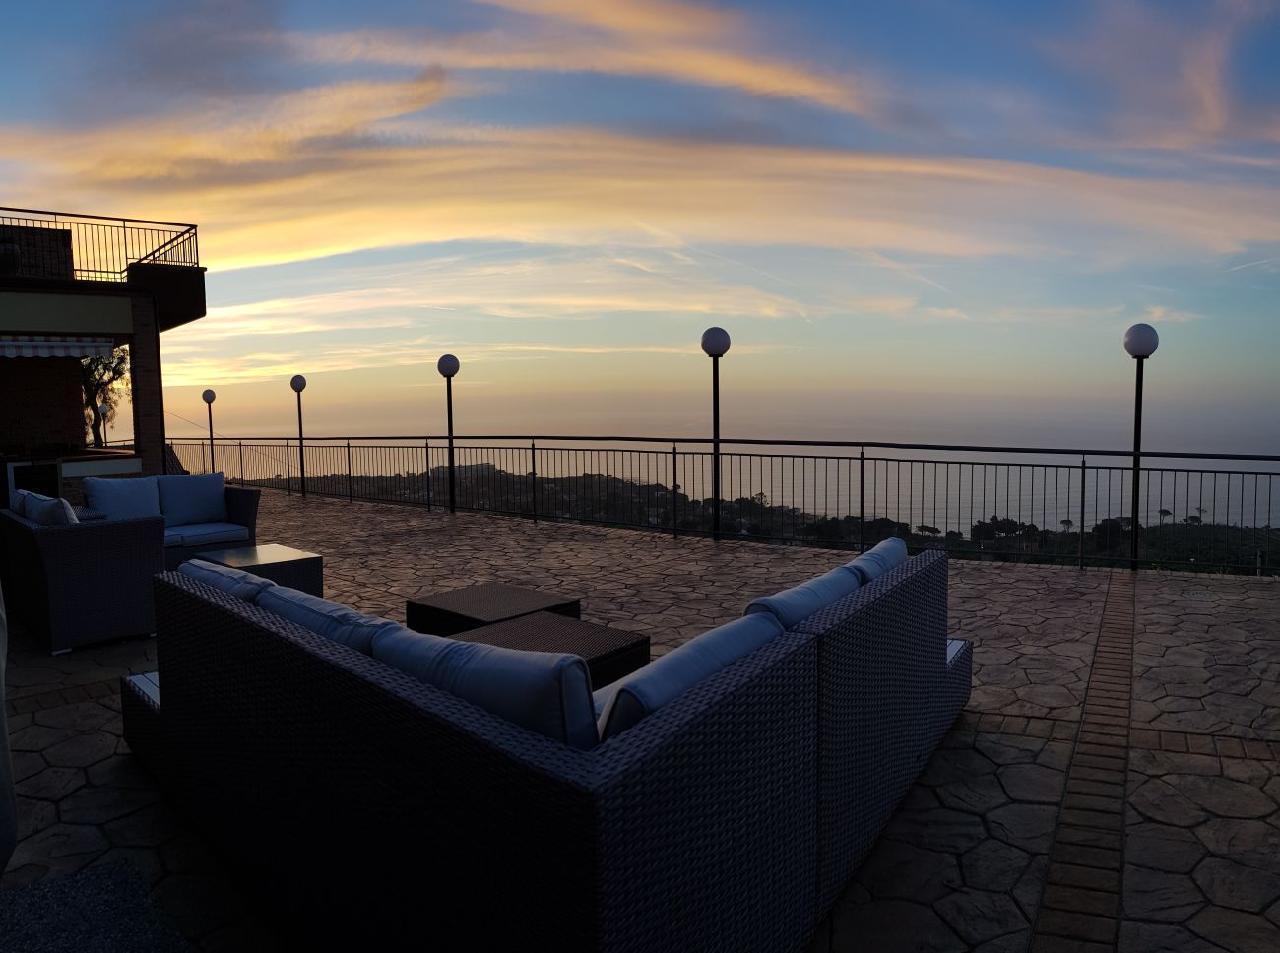 Maison de vacances Villa Le Terrazze Cefalù - Wunderschönes Haus mit Meersicht/Last-Minute Rabatt -30% (2620633), Cefalù, Palermo, Sicile, Italie, image 8